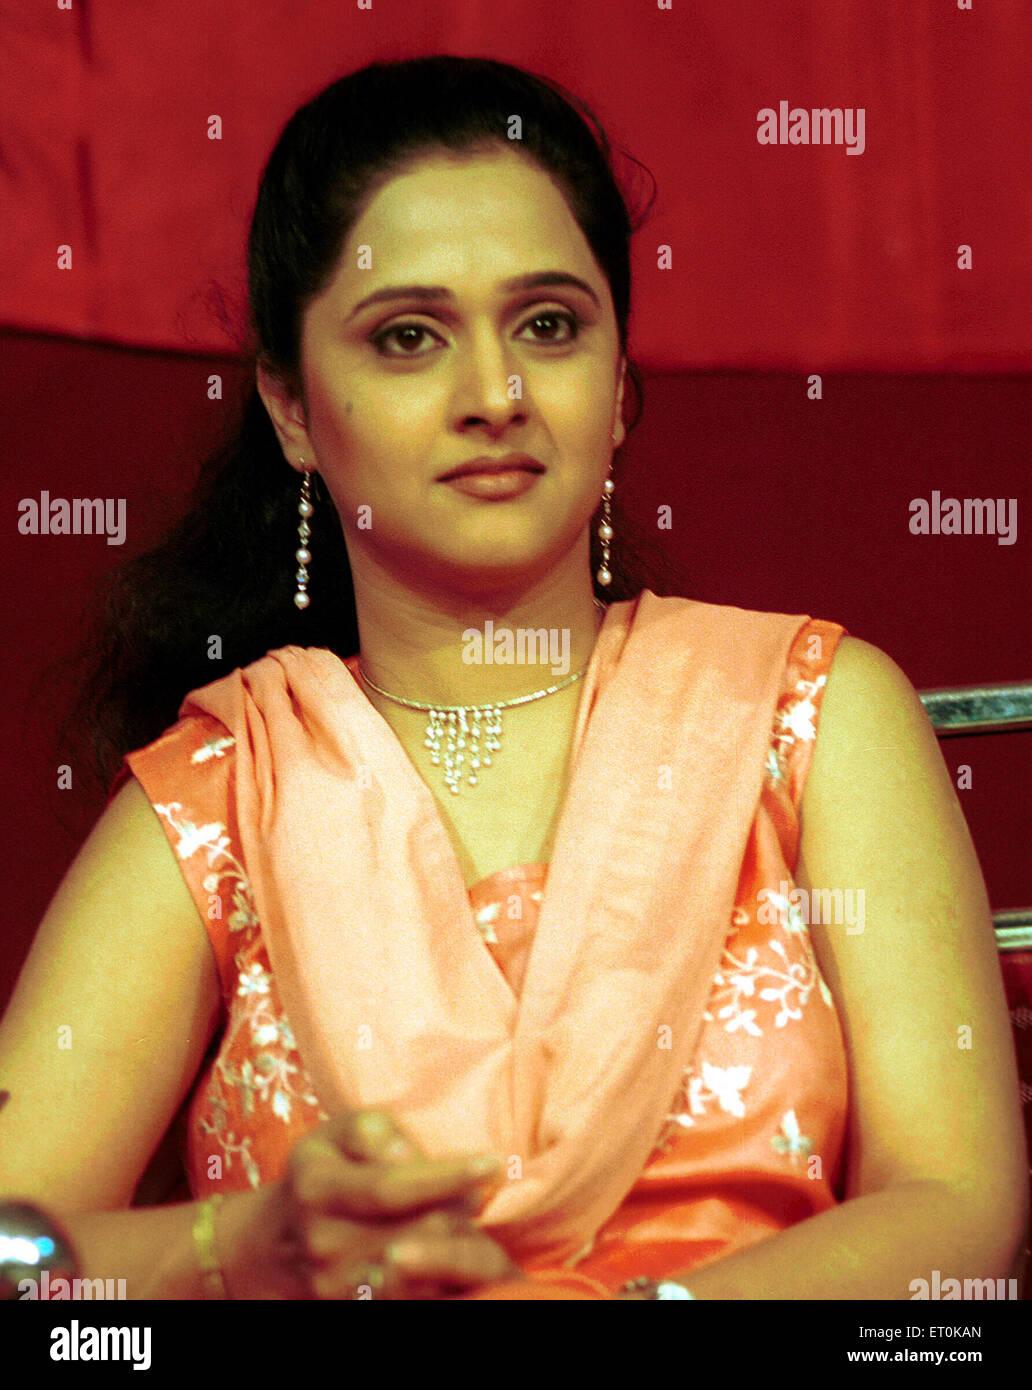 Marathi Film Persönlichkeit Mrunal Kulkarni während der Veranstaltung in Bombay Mumbai; Maharashtra; Indien Stockbild